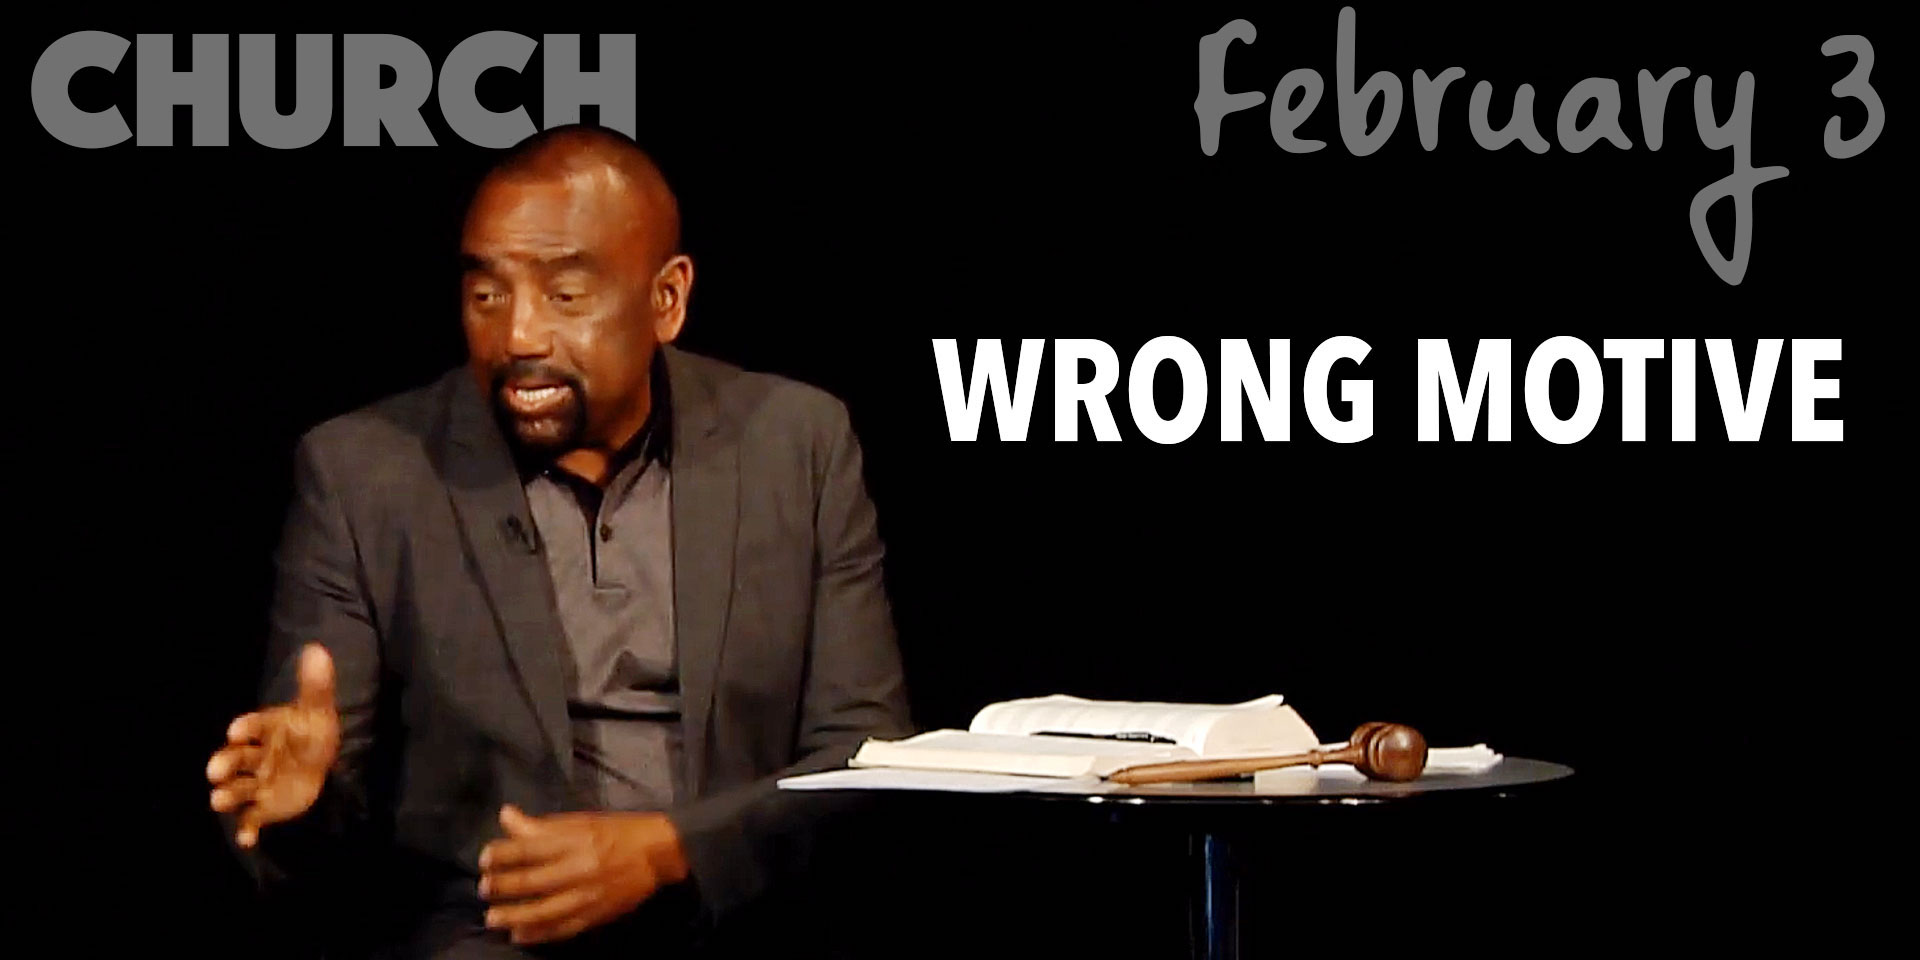 Church Feb 3: Watch Your Wrong Motives